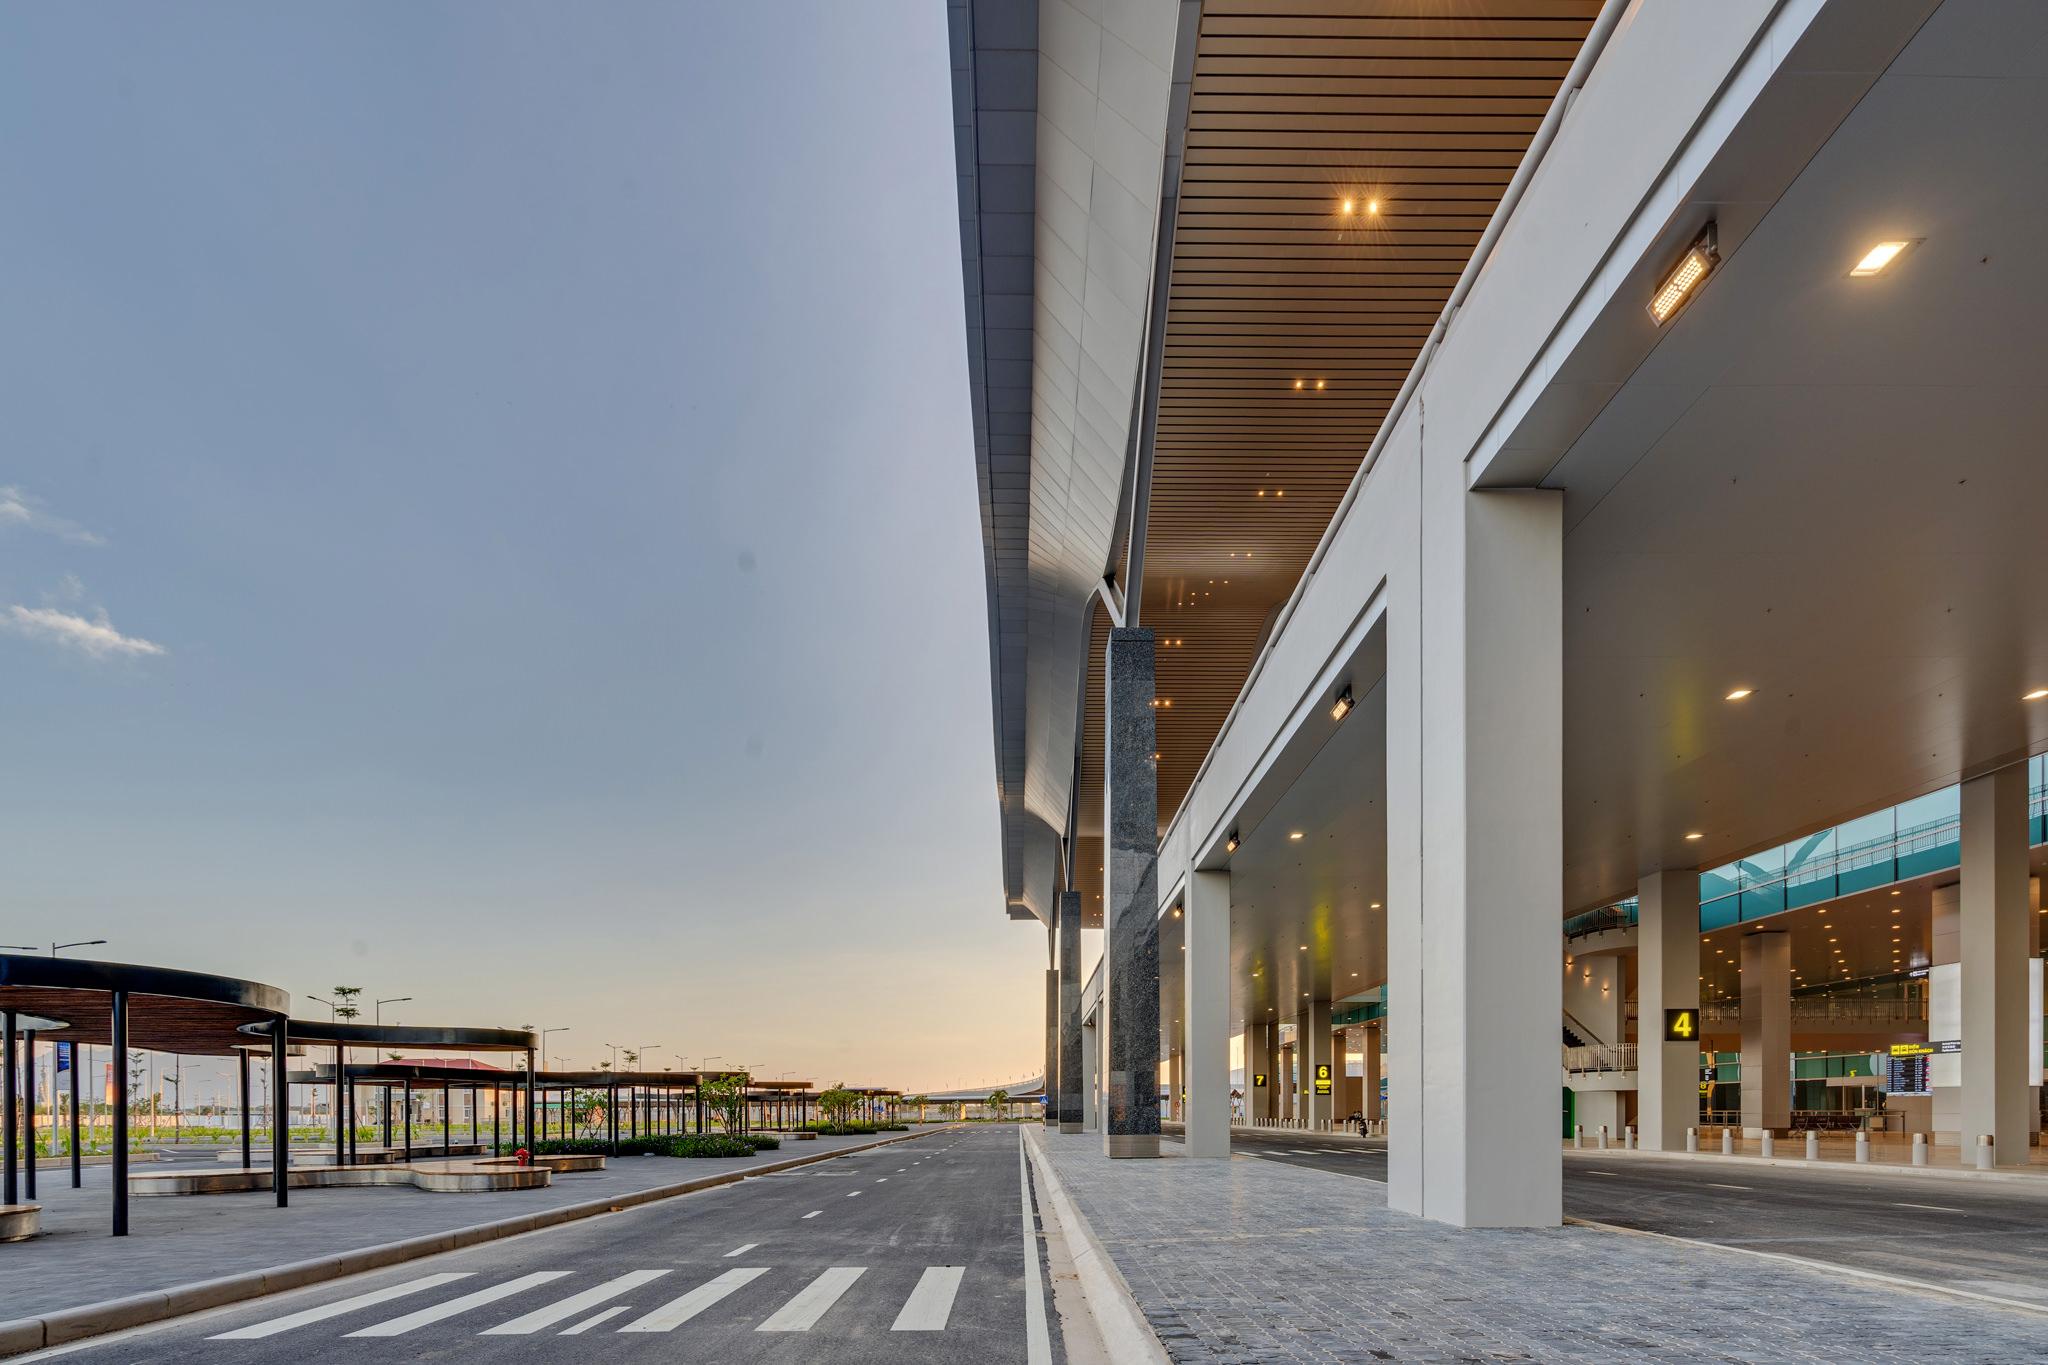 20180626 - Cam Ranh Airport - Architecture - 0032.jpg